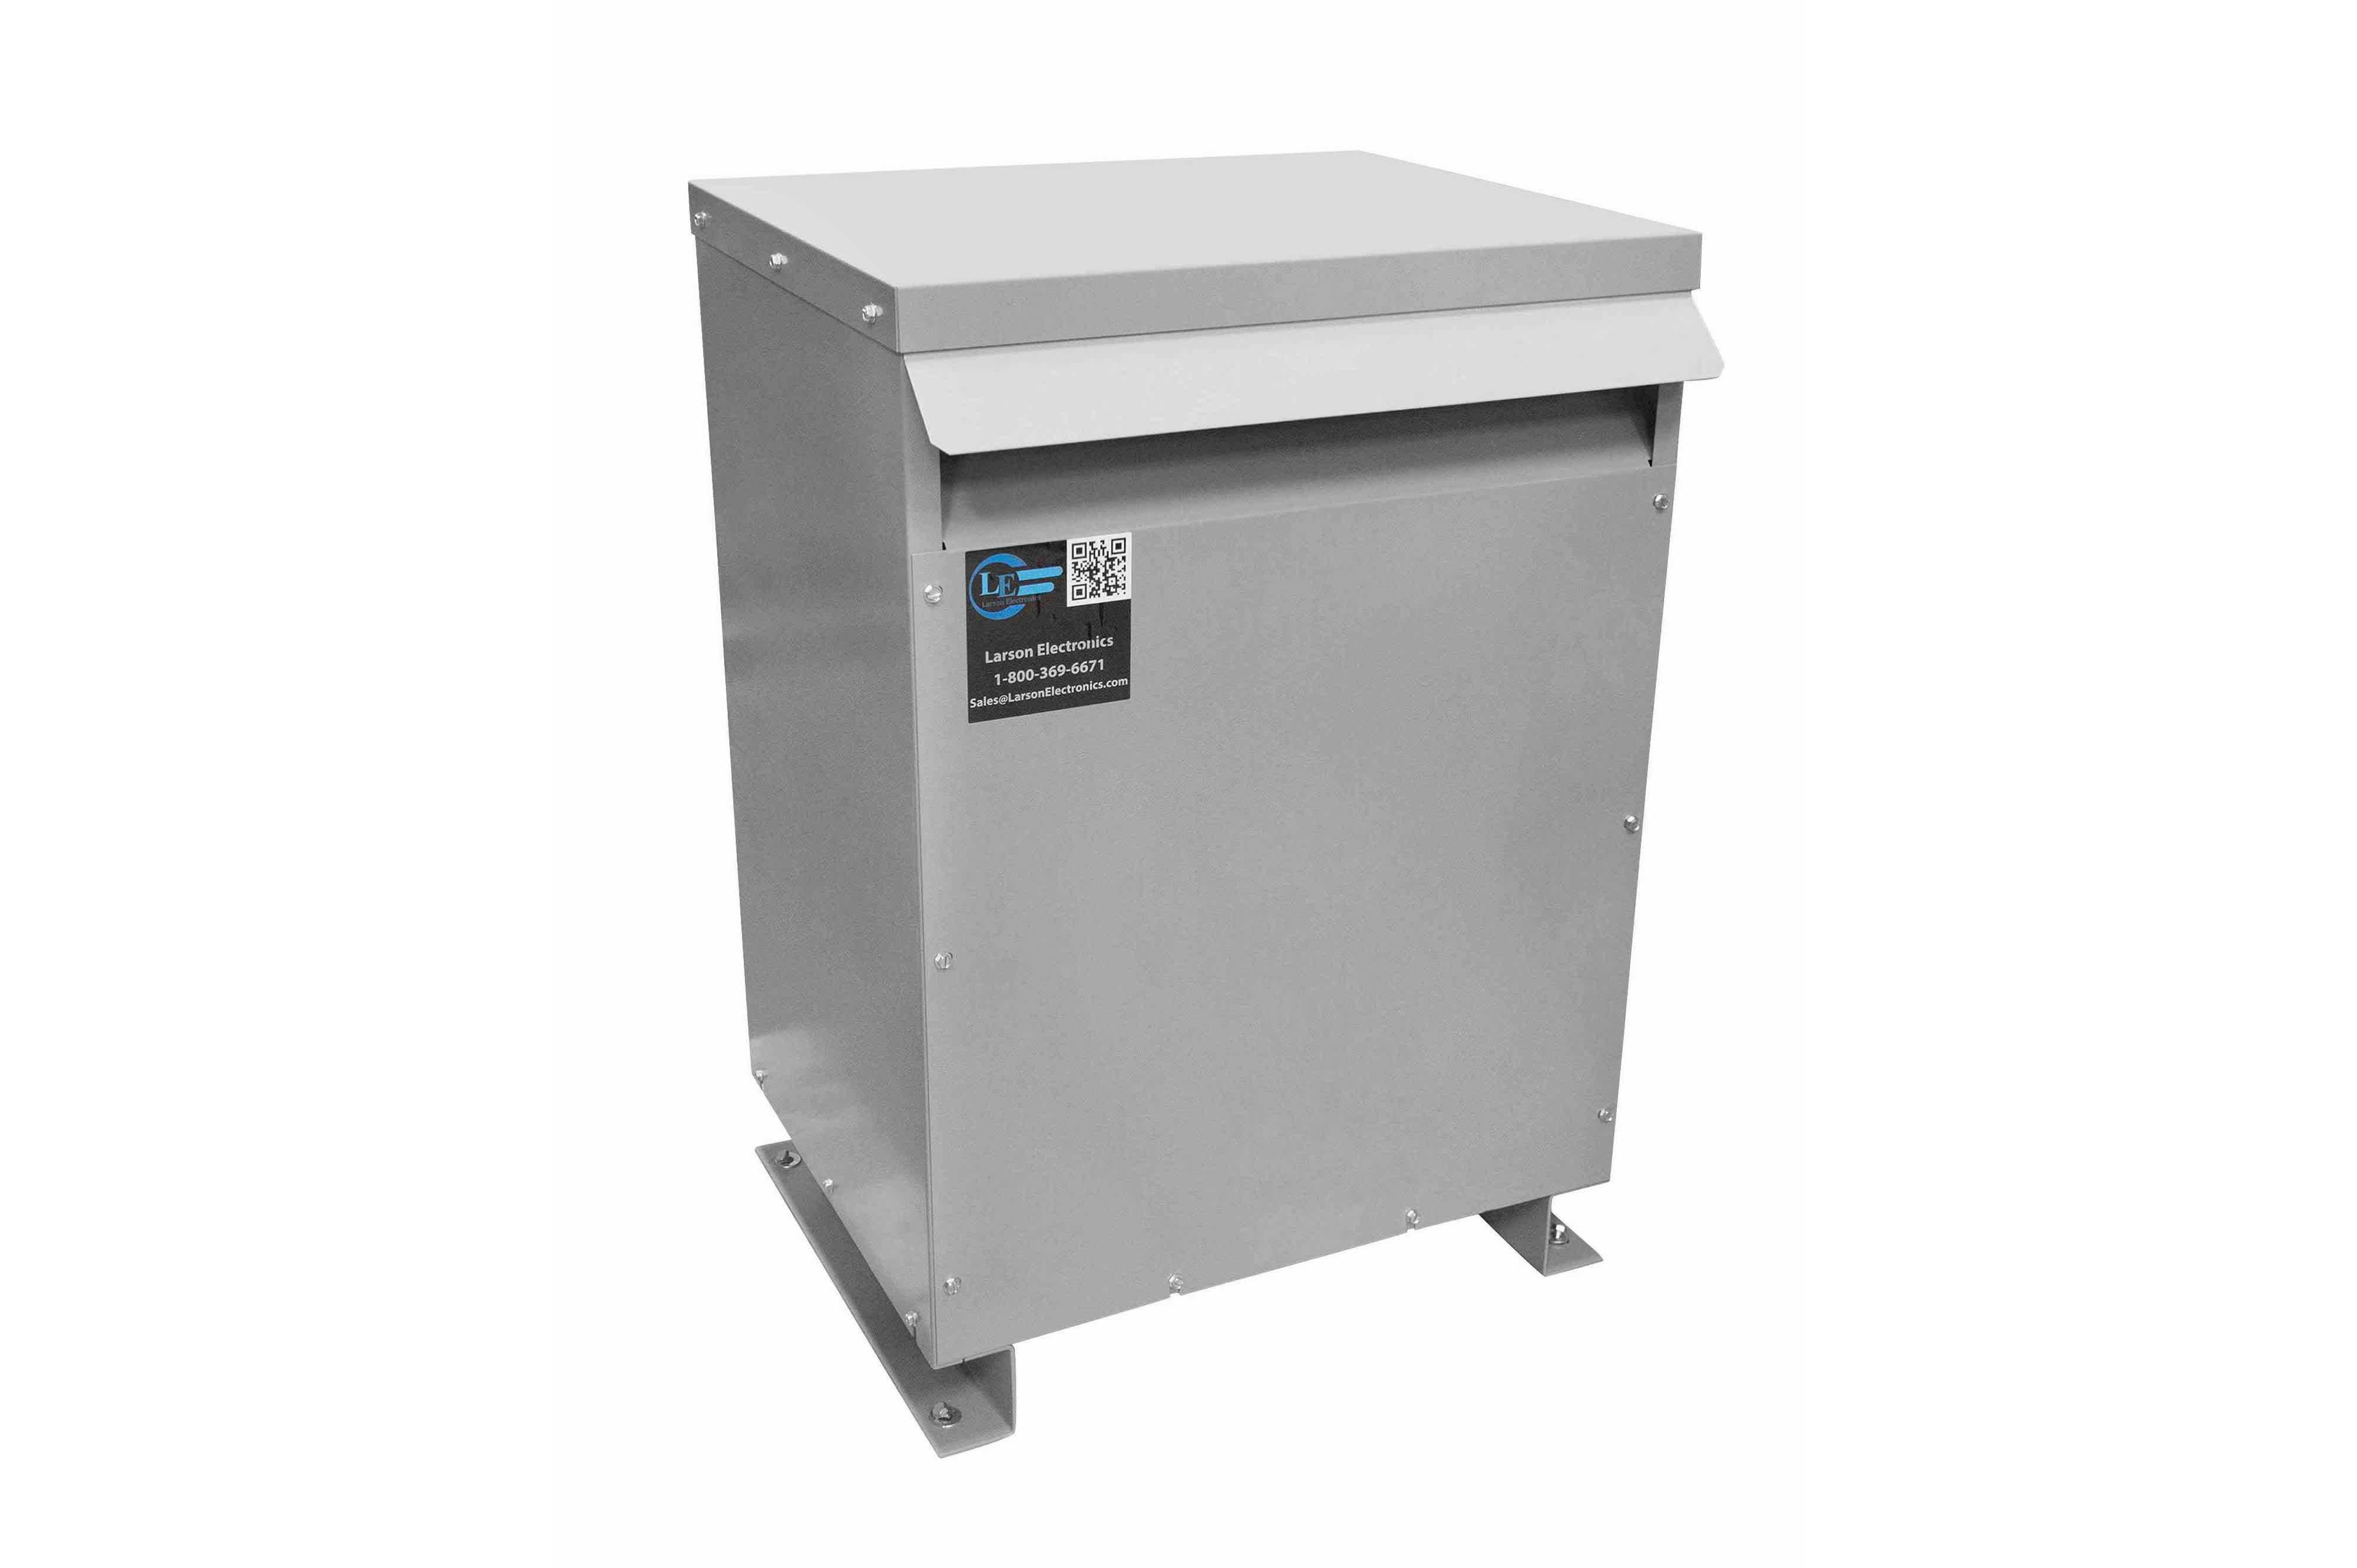 115 kVA 3PH Isolation Transformer, 600V Wye Primary, 380Y/220 Wye-N Secondary, N3R, Ventilated, 60 Hz